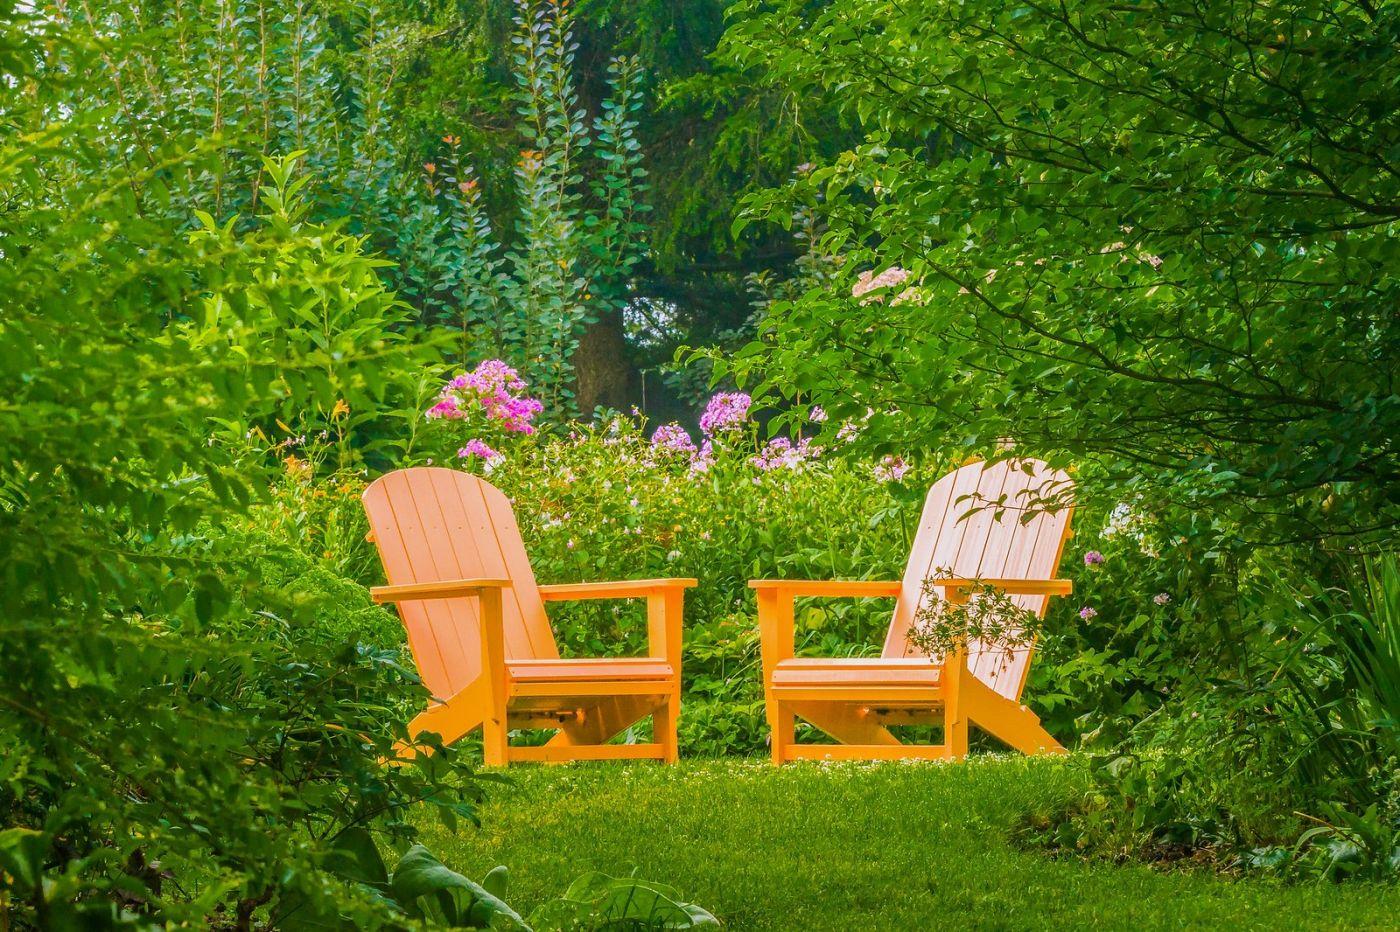 Chanticleer花园,春风得意